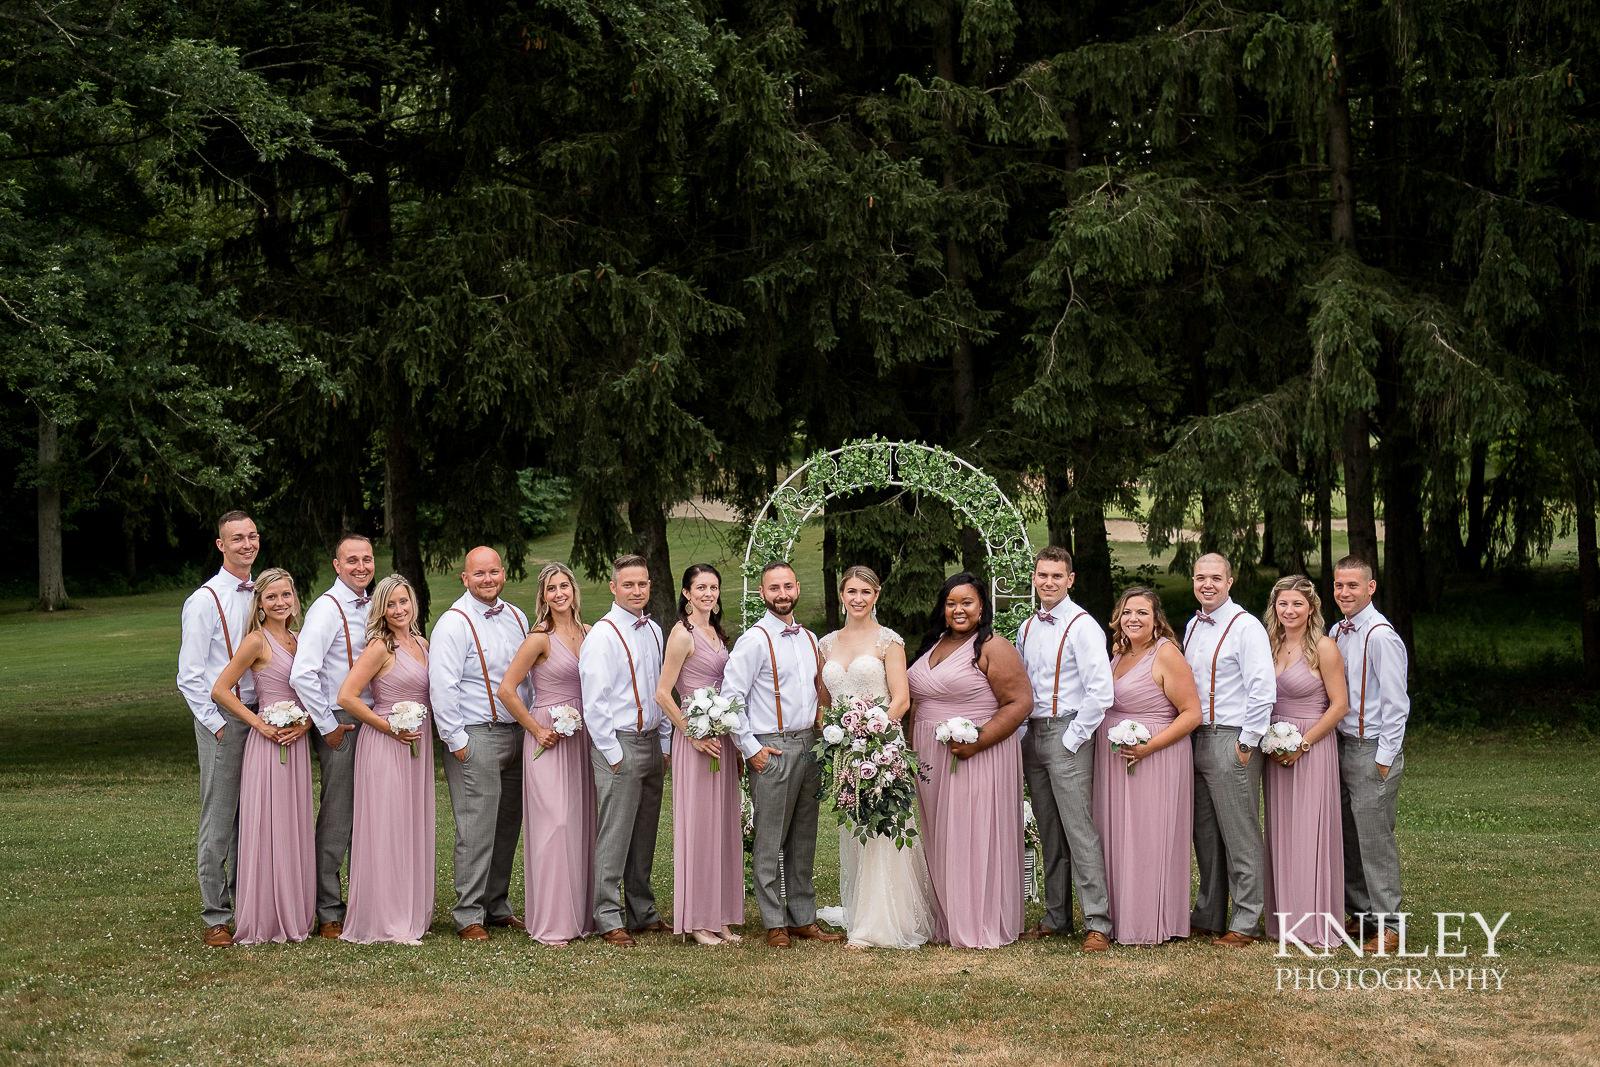 059 - Ontario Golf Club Wedding Pictures - XT2B8532.jpg